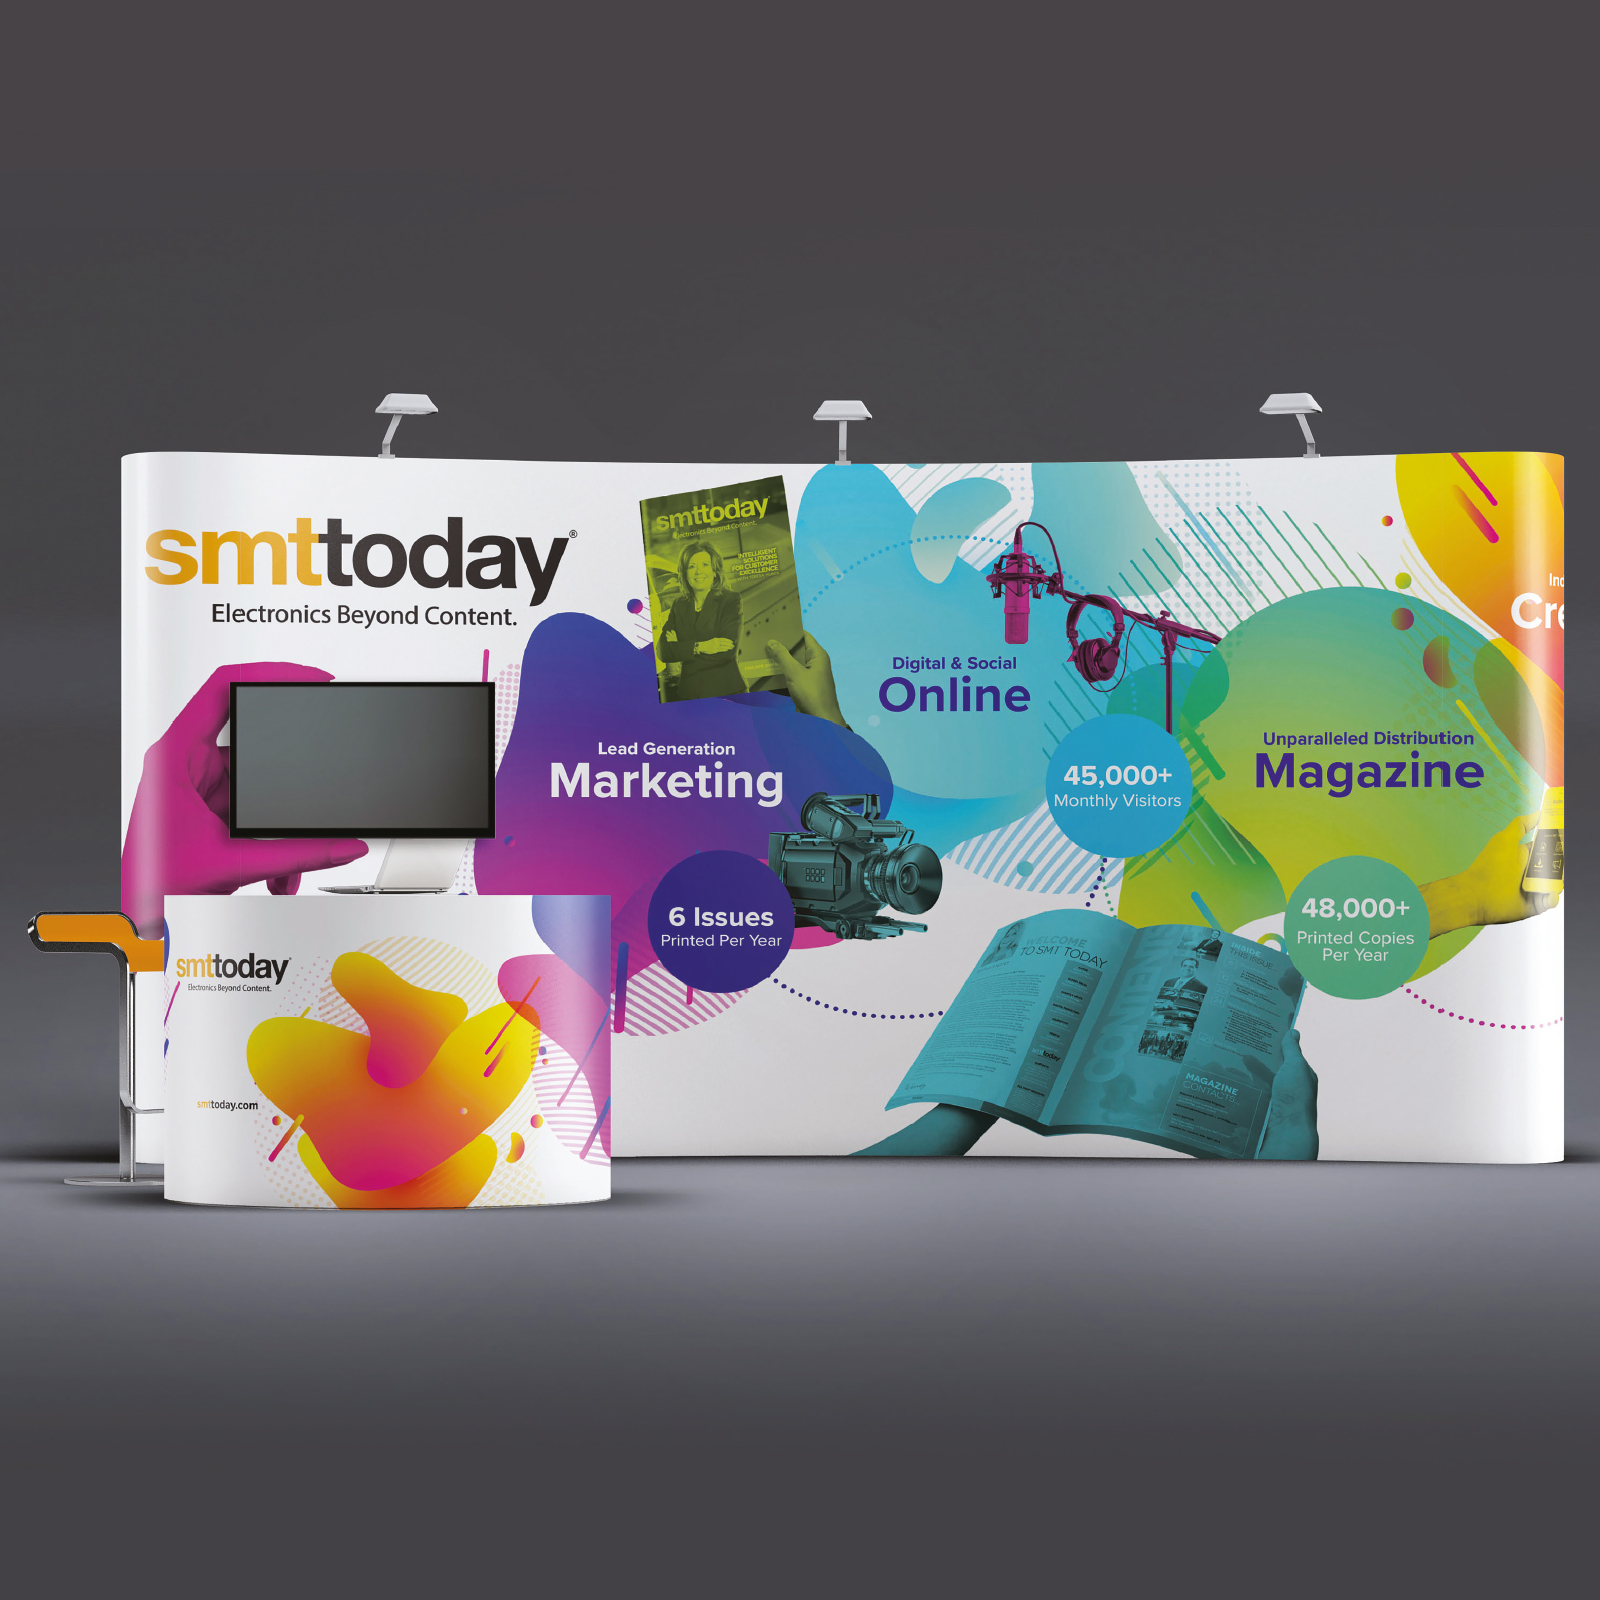 SMT Today Exhibition Design